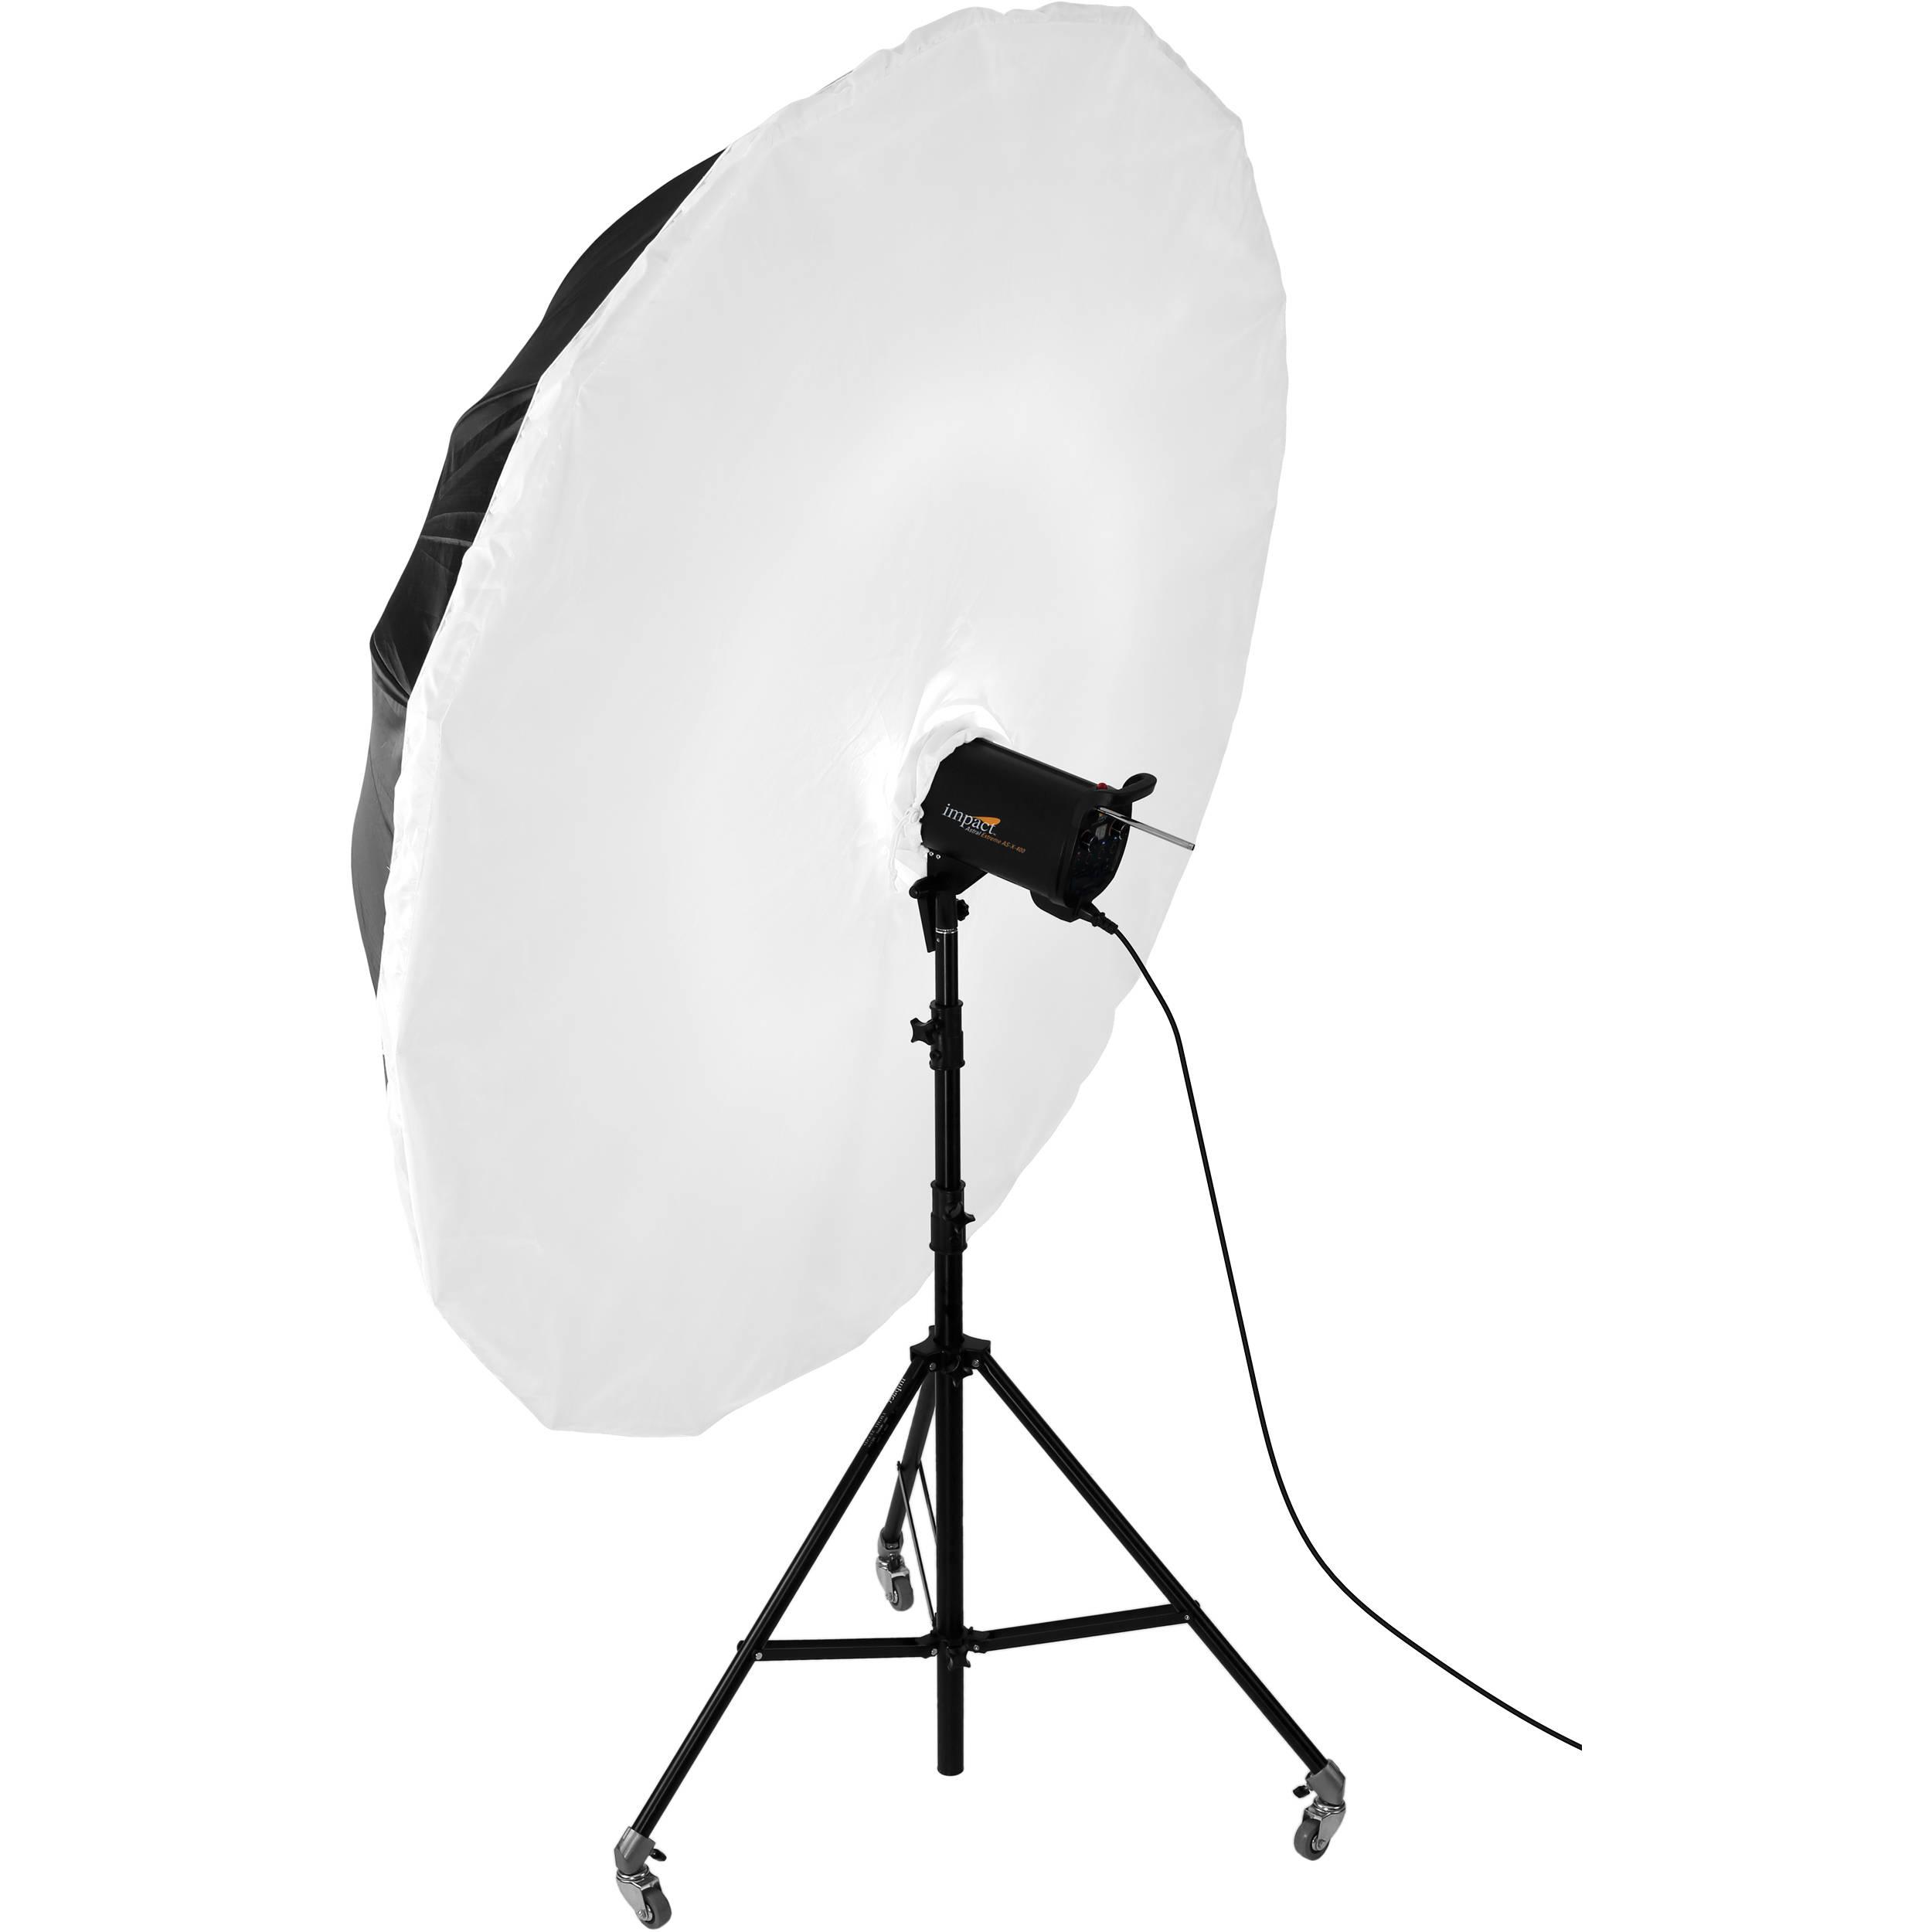 Studio Lighting Diffuser: Impact 7' Parabolic Umbrella Diffuser UP-7D B&H Photo Video